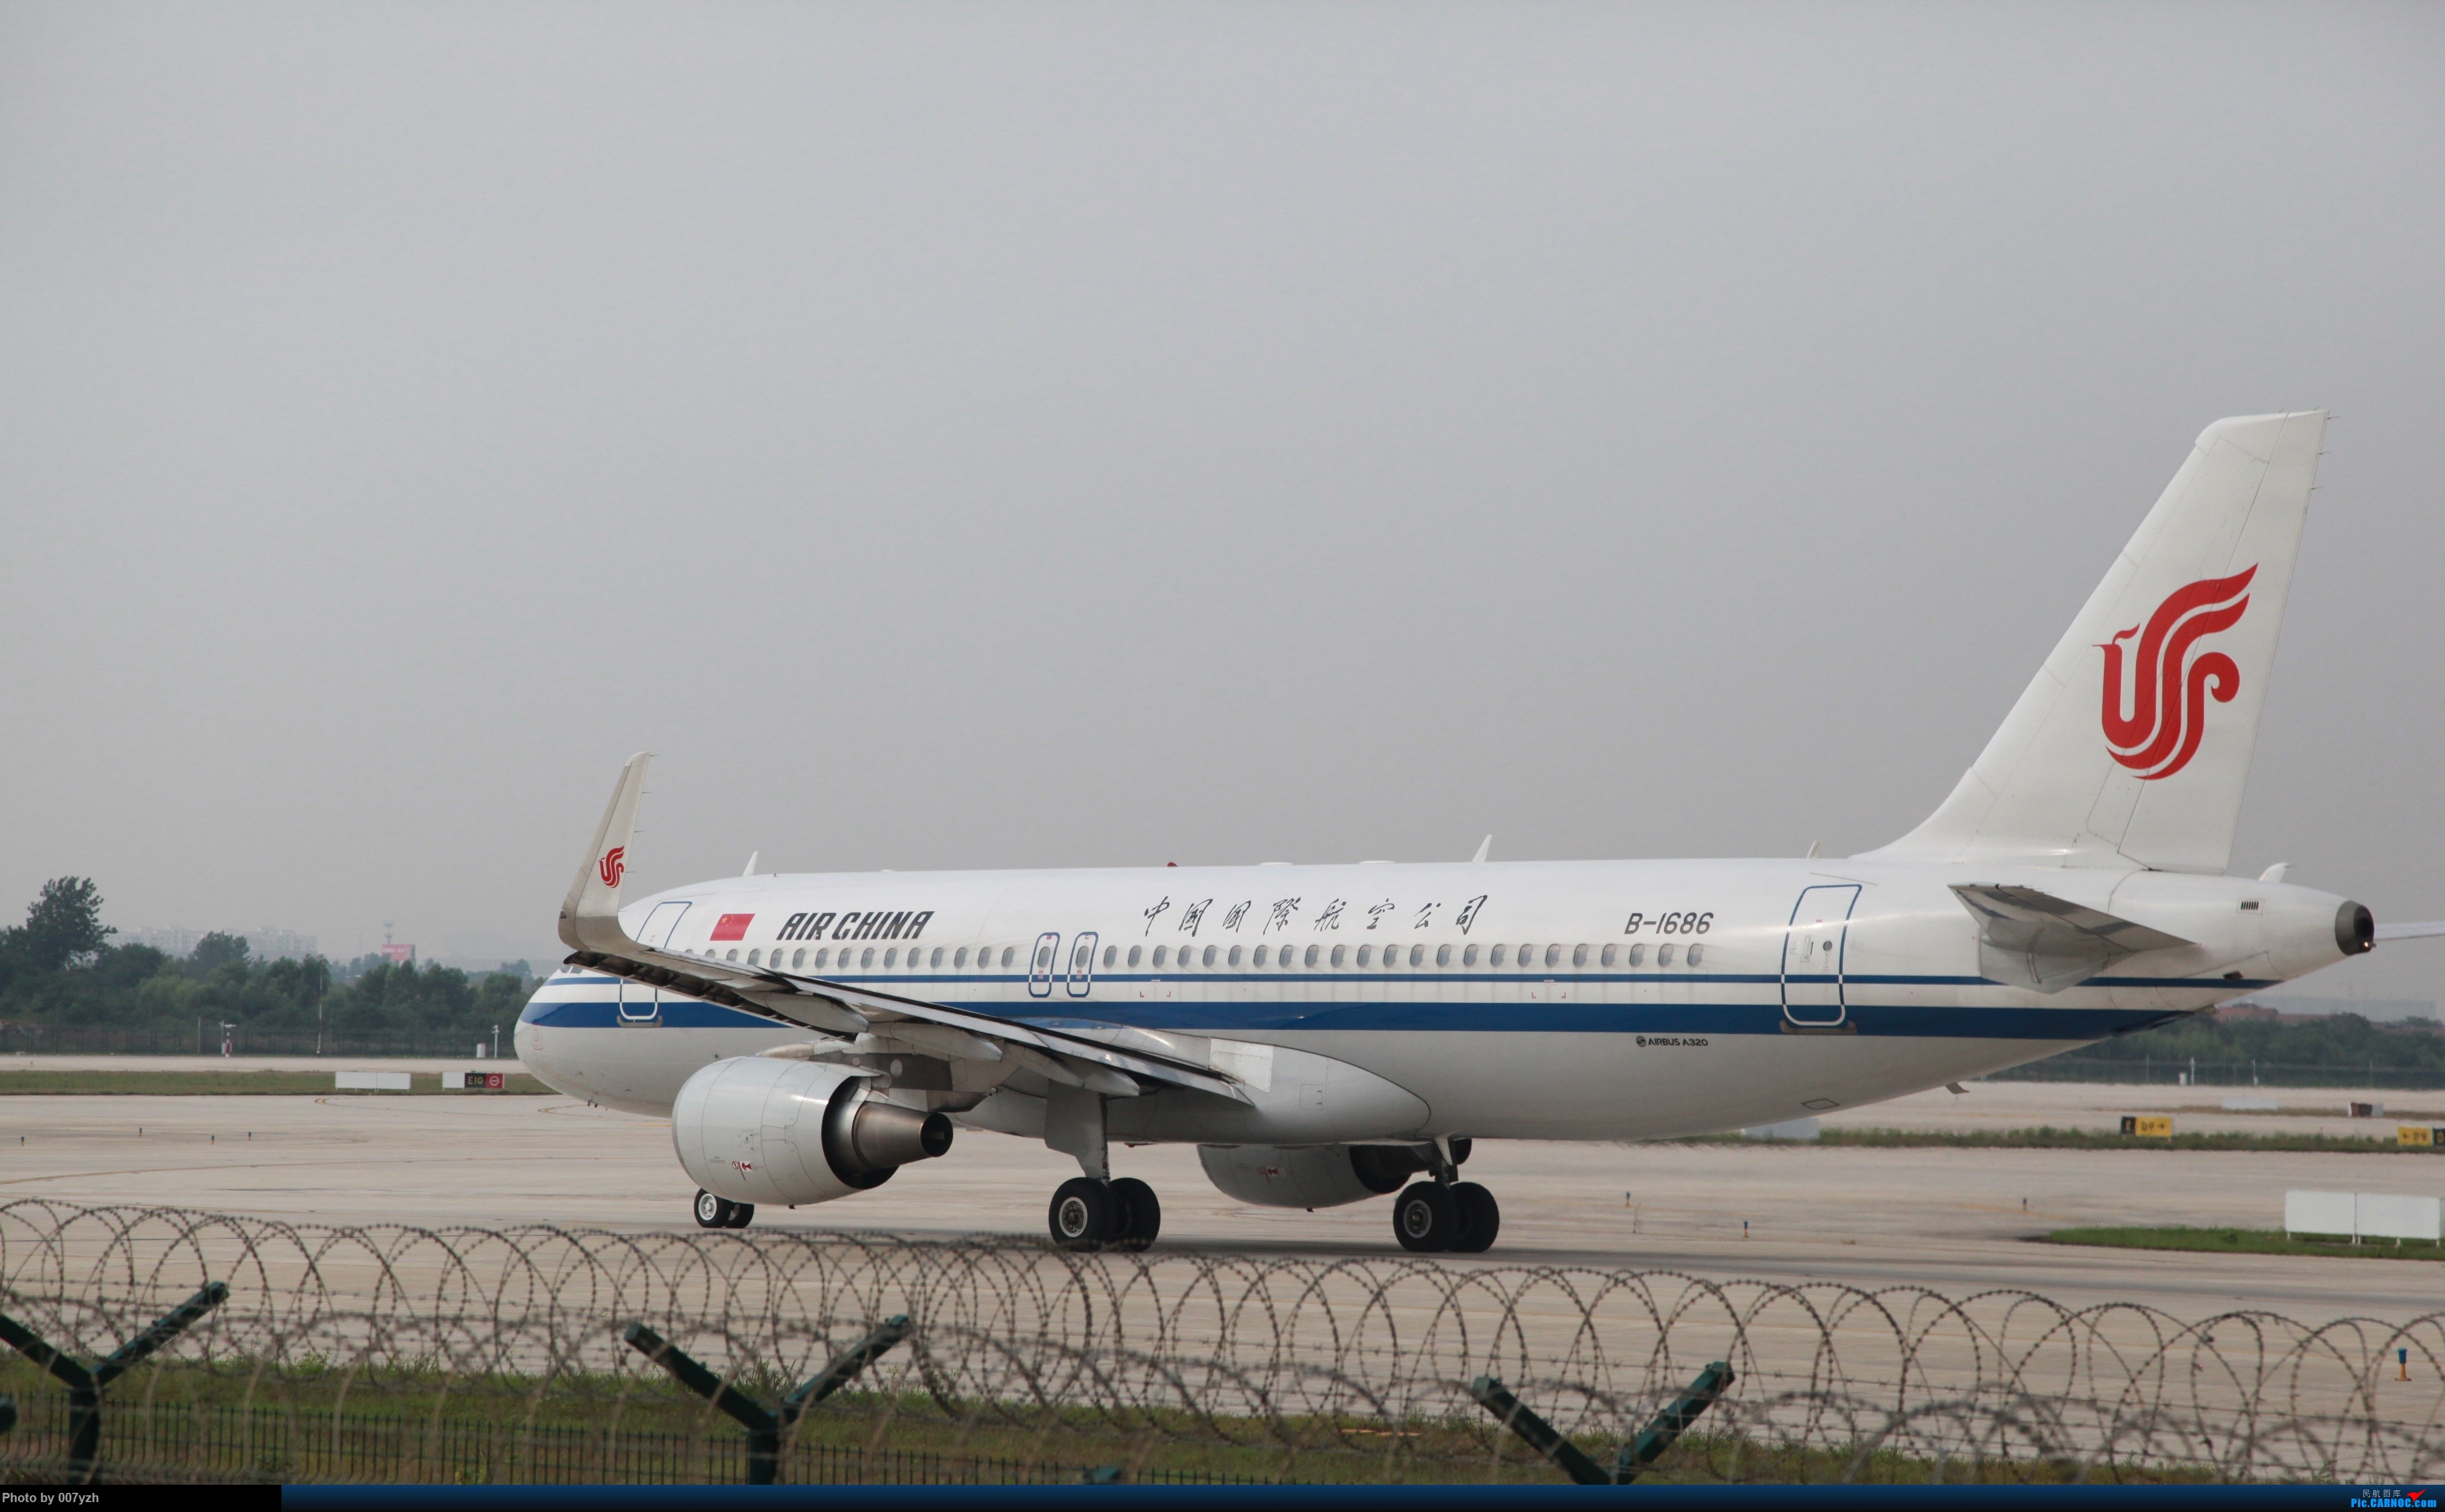 Re:[原创]7月5号WUH拍机,又是一个水泥天~ AIRBUS A320-200 B-1686 中国武汉天河国际机场